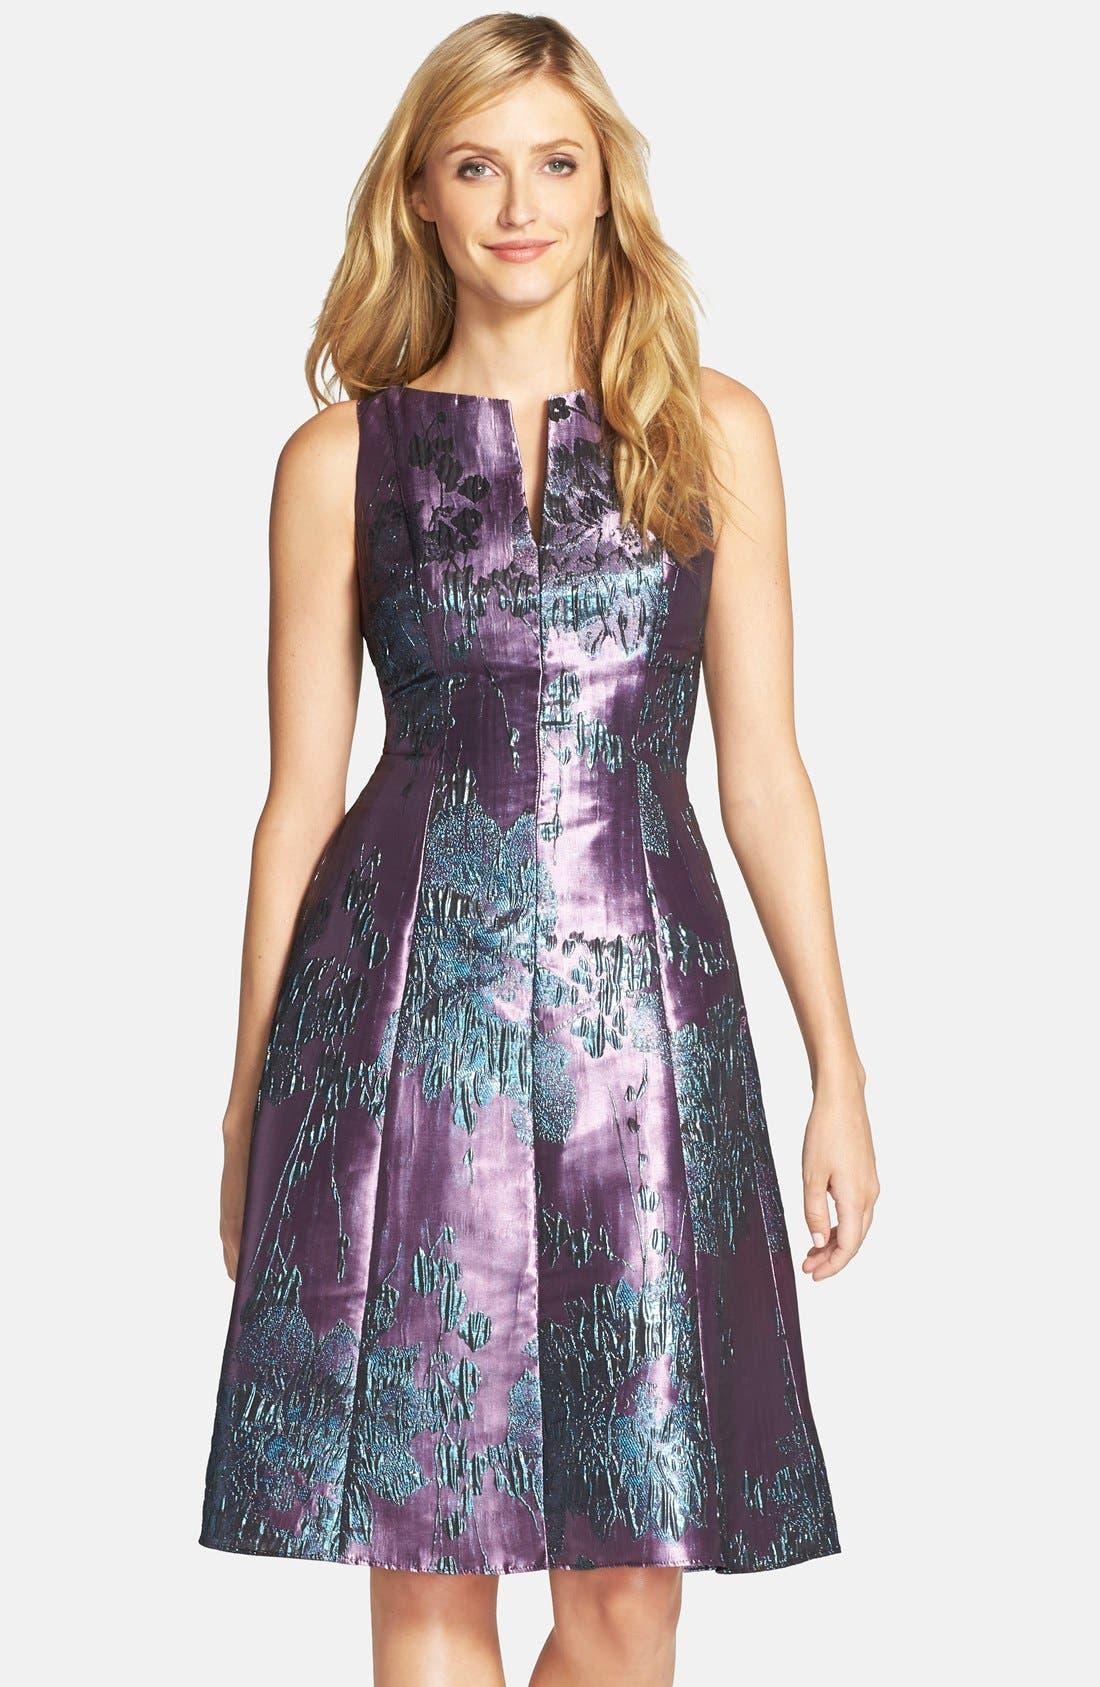 Main Image - Adrianna Papell Metallic Jacquard Fit & Flare Dress (Regular & Petite)